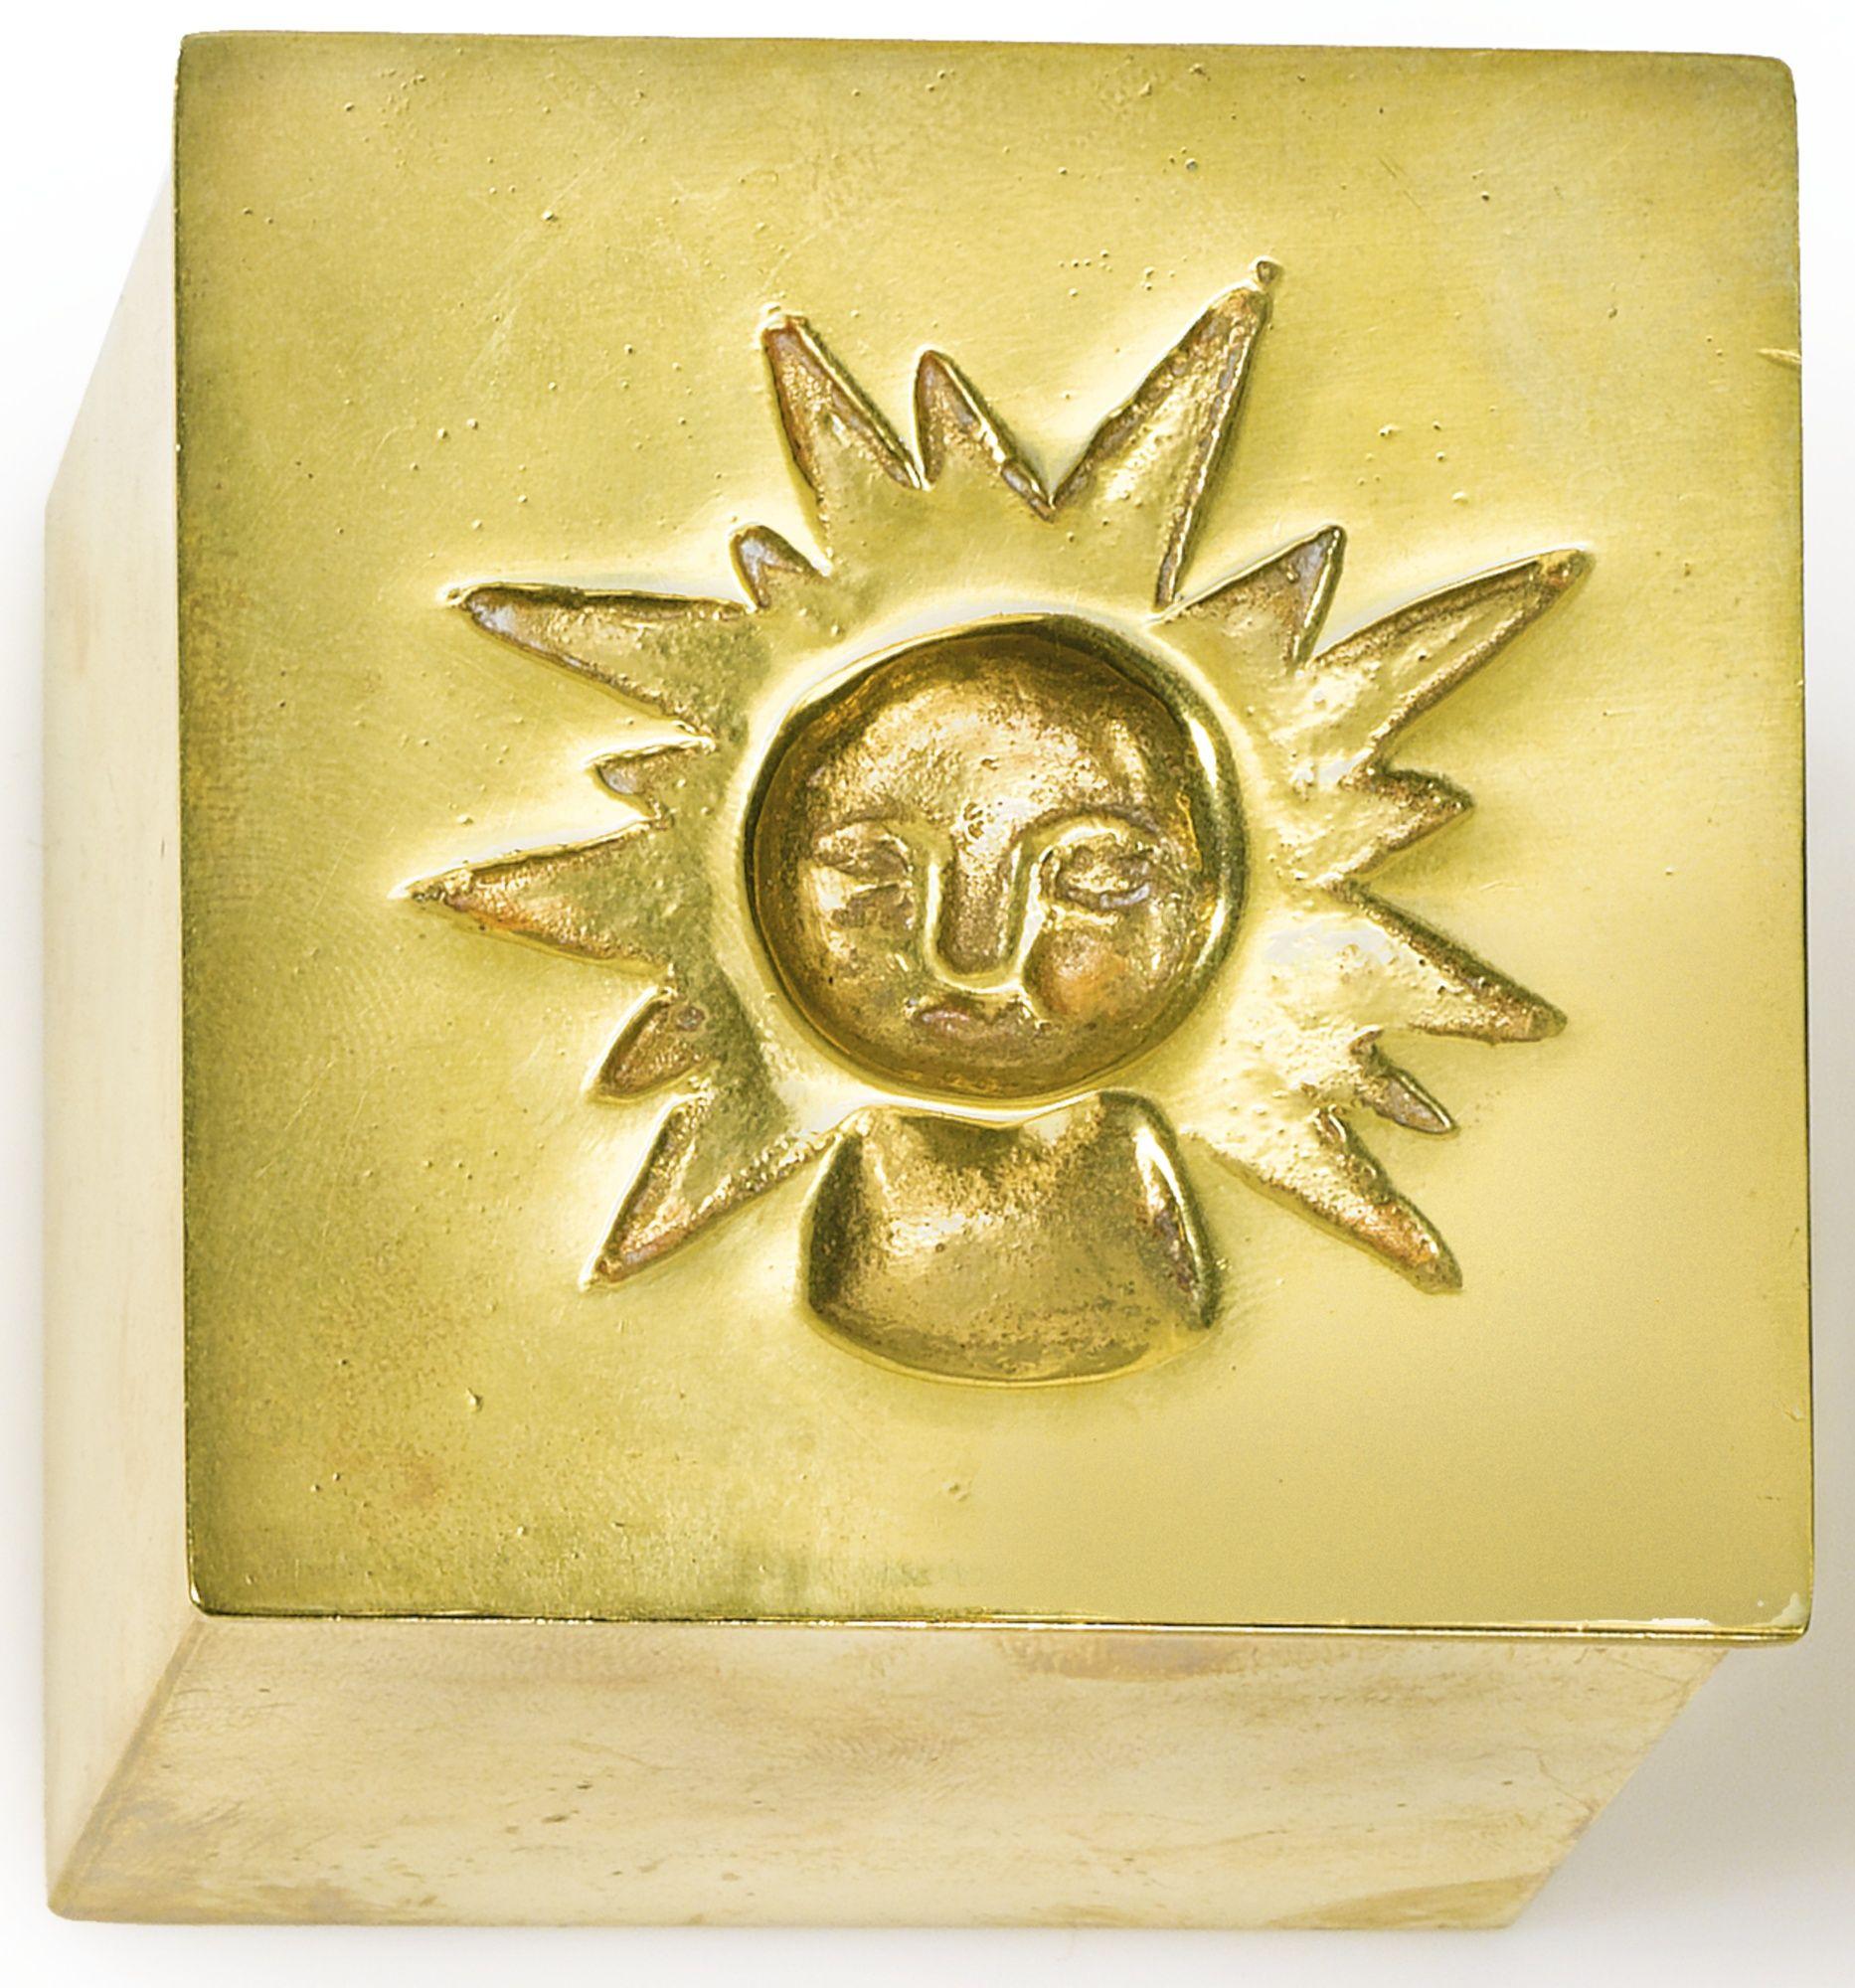 "LINE VAUTRIN "" Soleil et Lune"" Box, circa 1945 | Gilt bronze and cork; iImpressed ""LINE VAUTRIN; 2 5/8 x 2 3/8 x 2 1/2 in. (6.7 x 6 x 6.4 cm) | SOTHEBY'S"